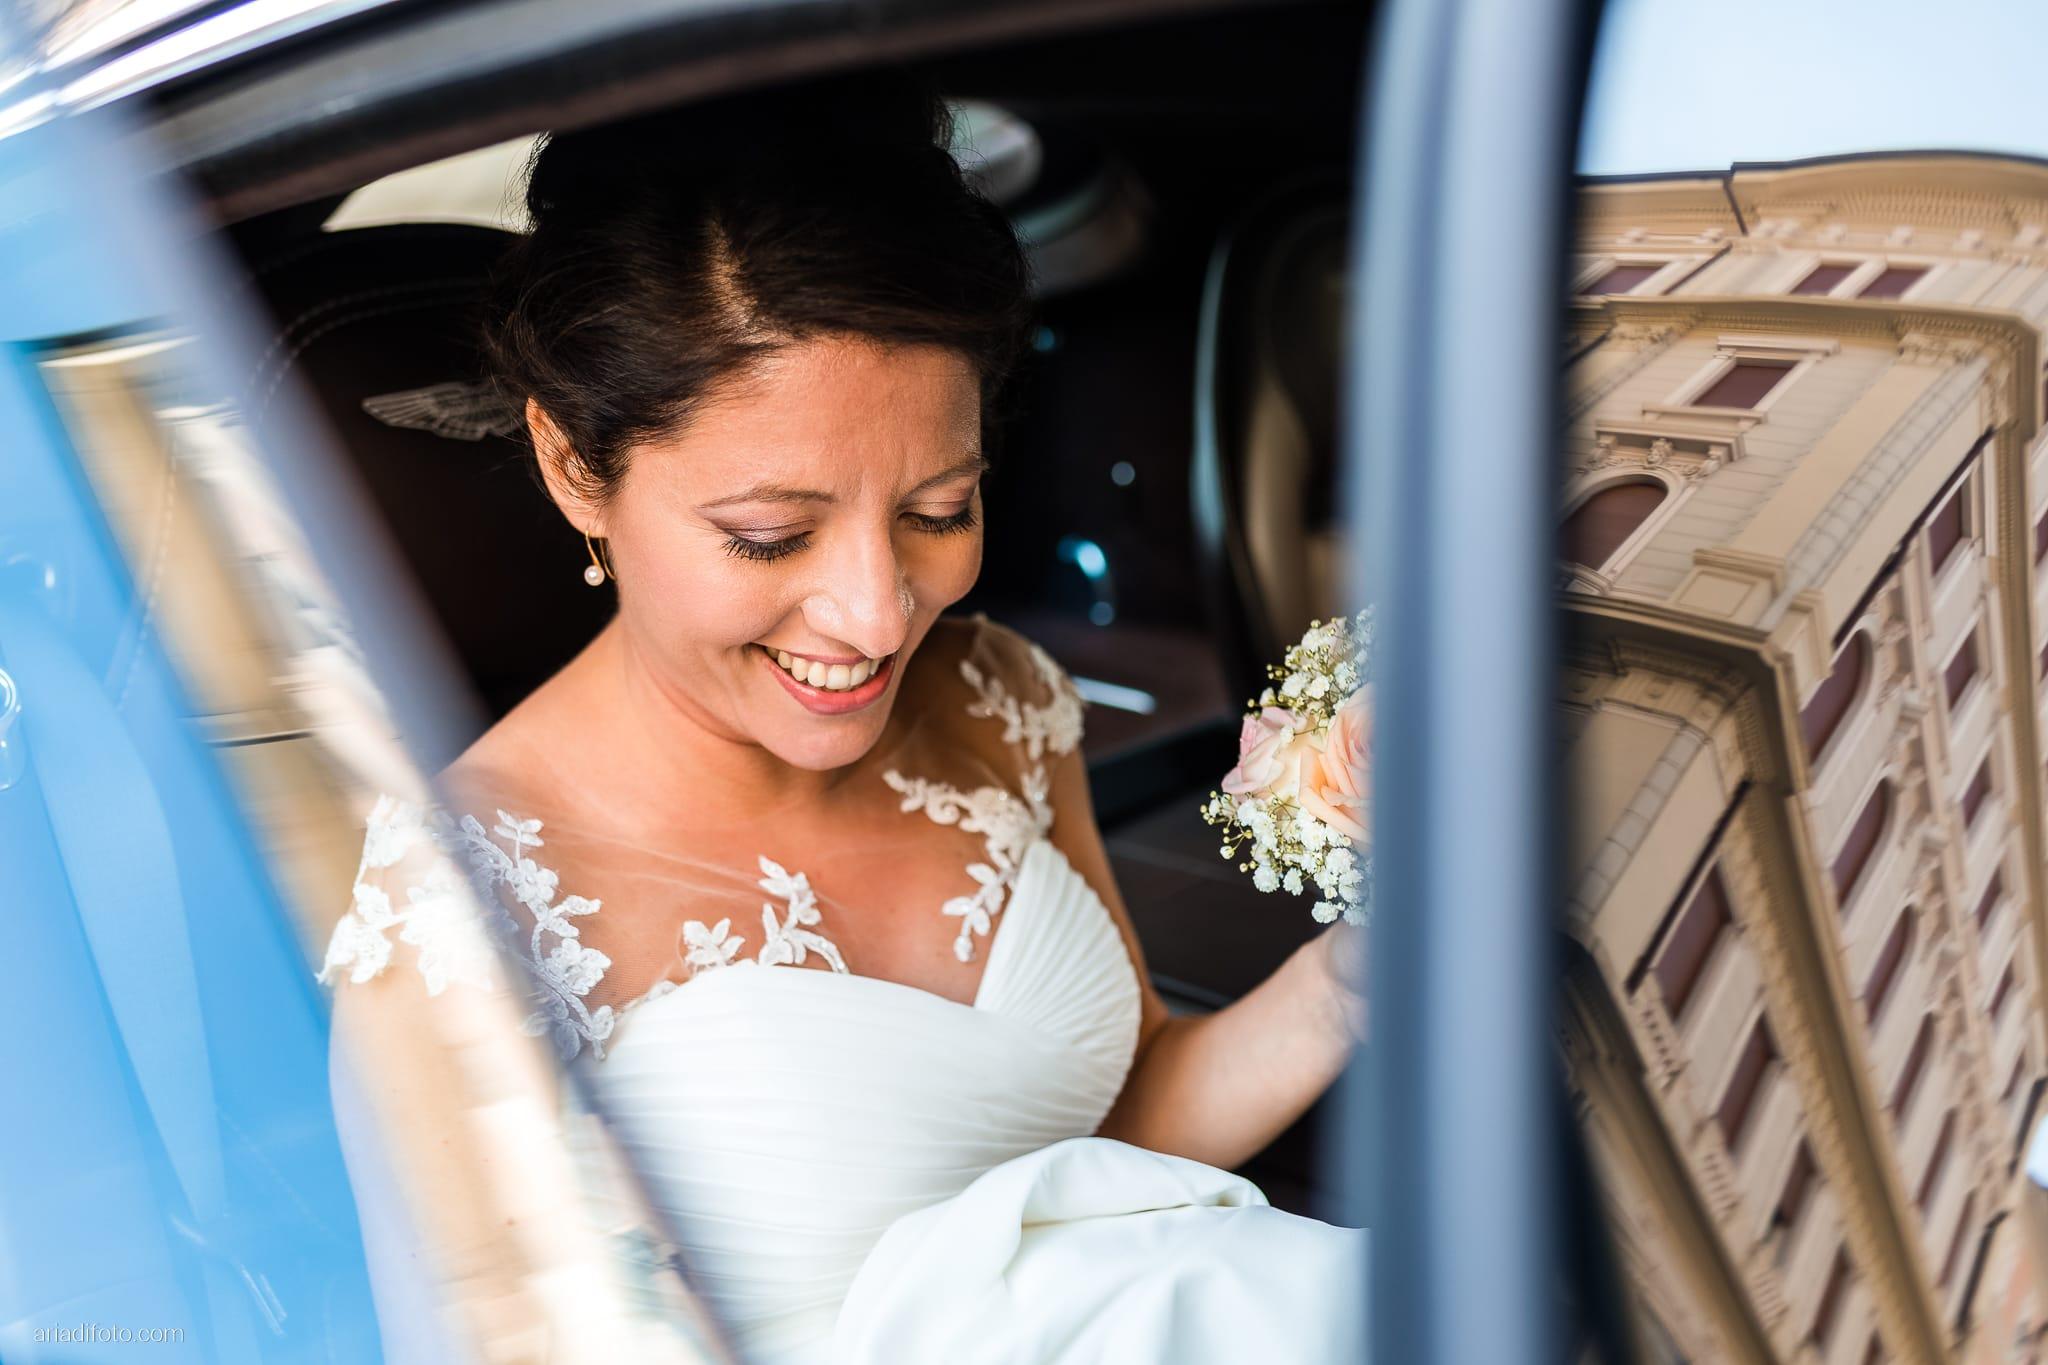 Tatiana Marco Matrimonio Trieste Baronesse Tacco San Floriano Collio Gorizia preparativi sposa riflesso